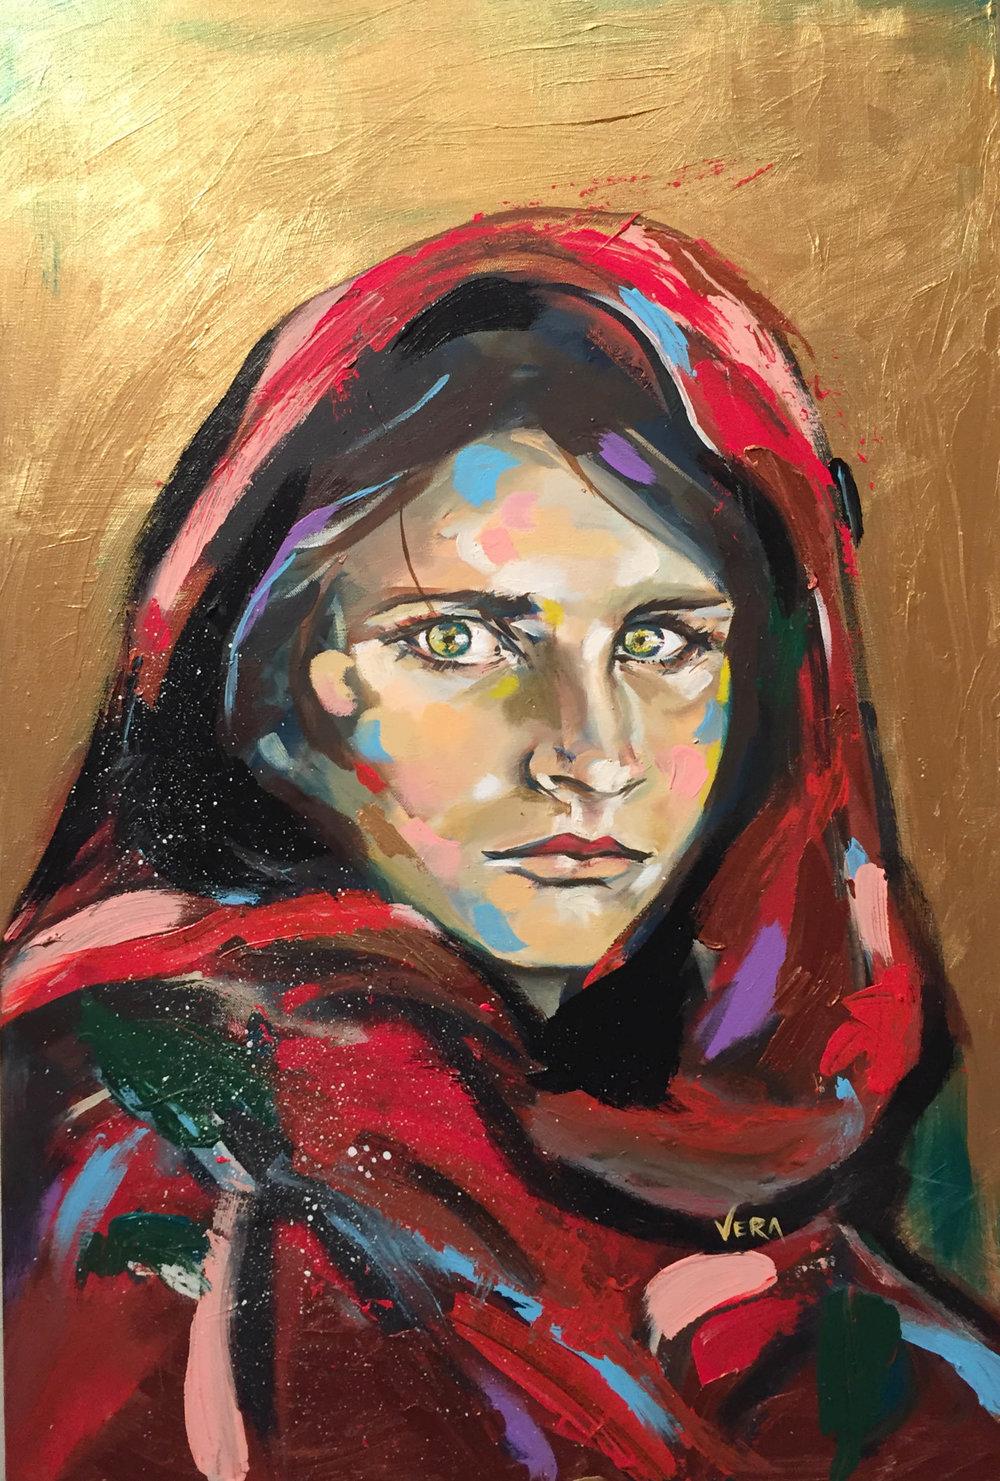 Afgan Girl Cynthia Vera.jpg